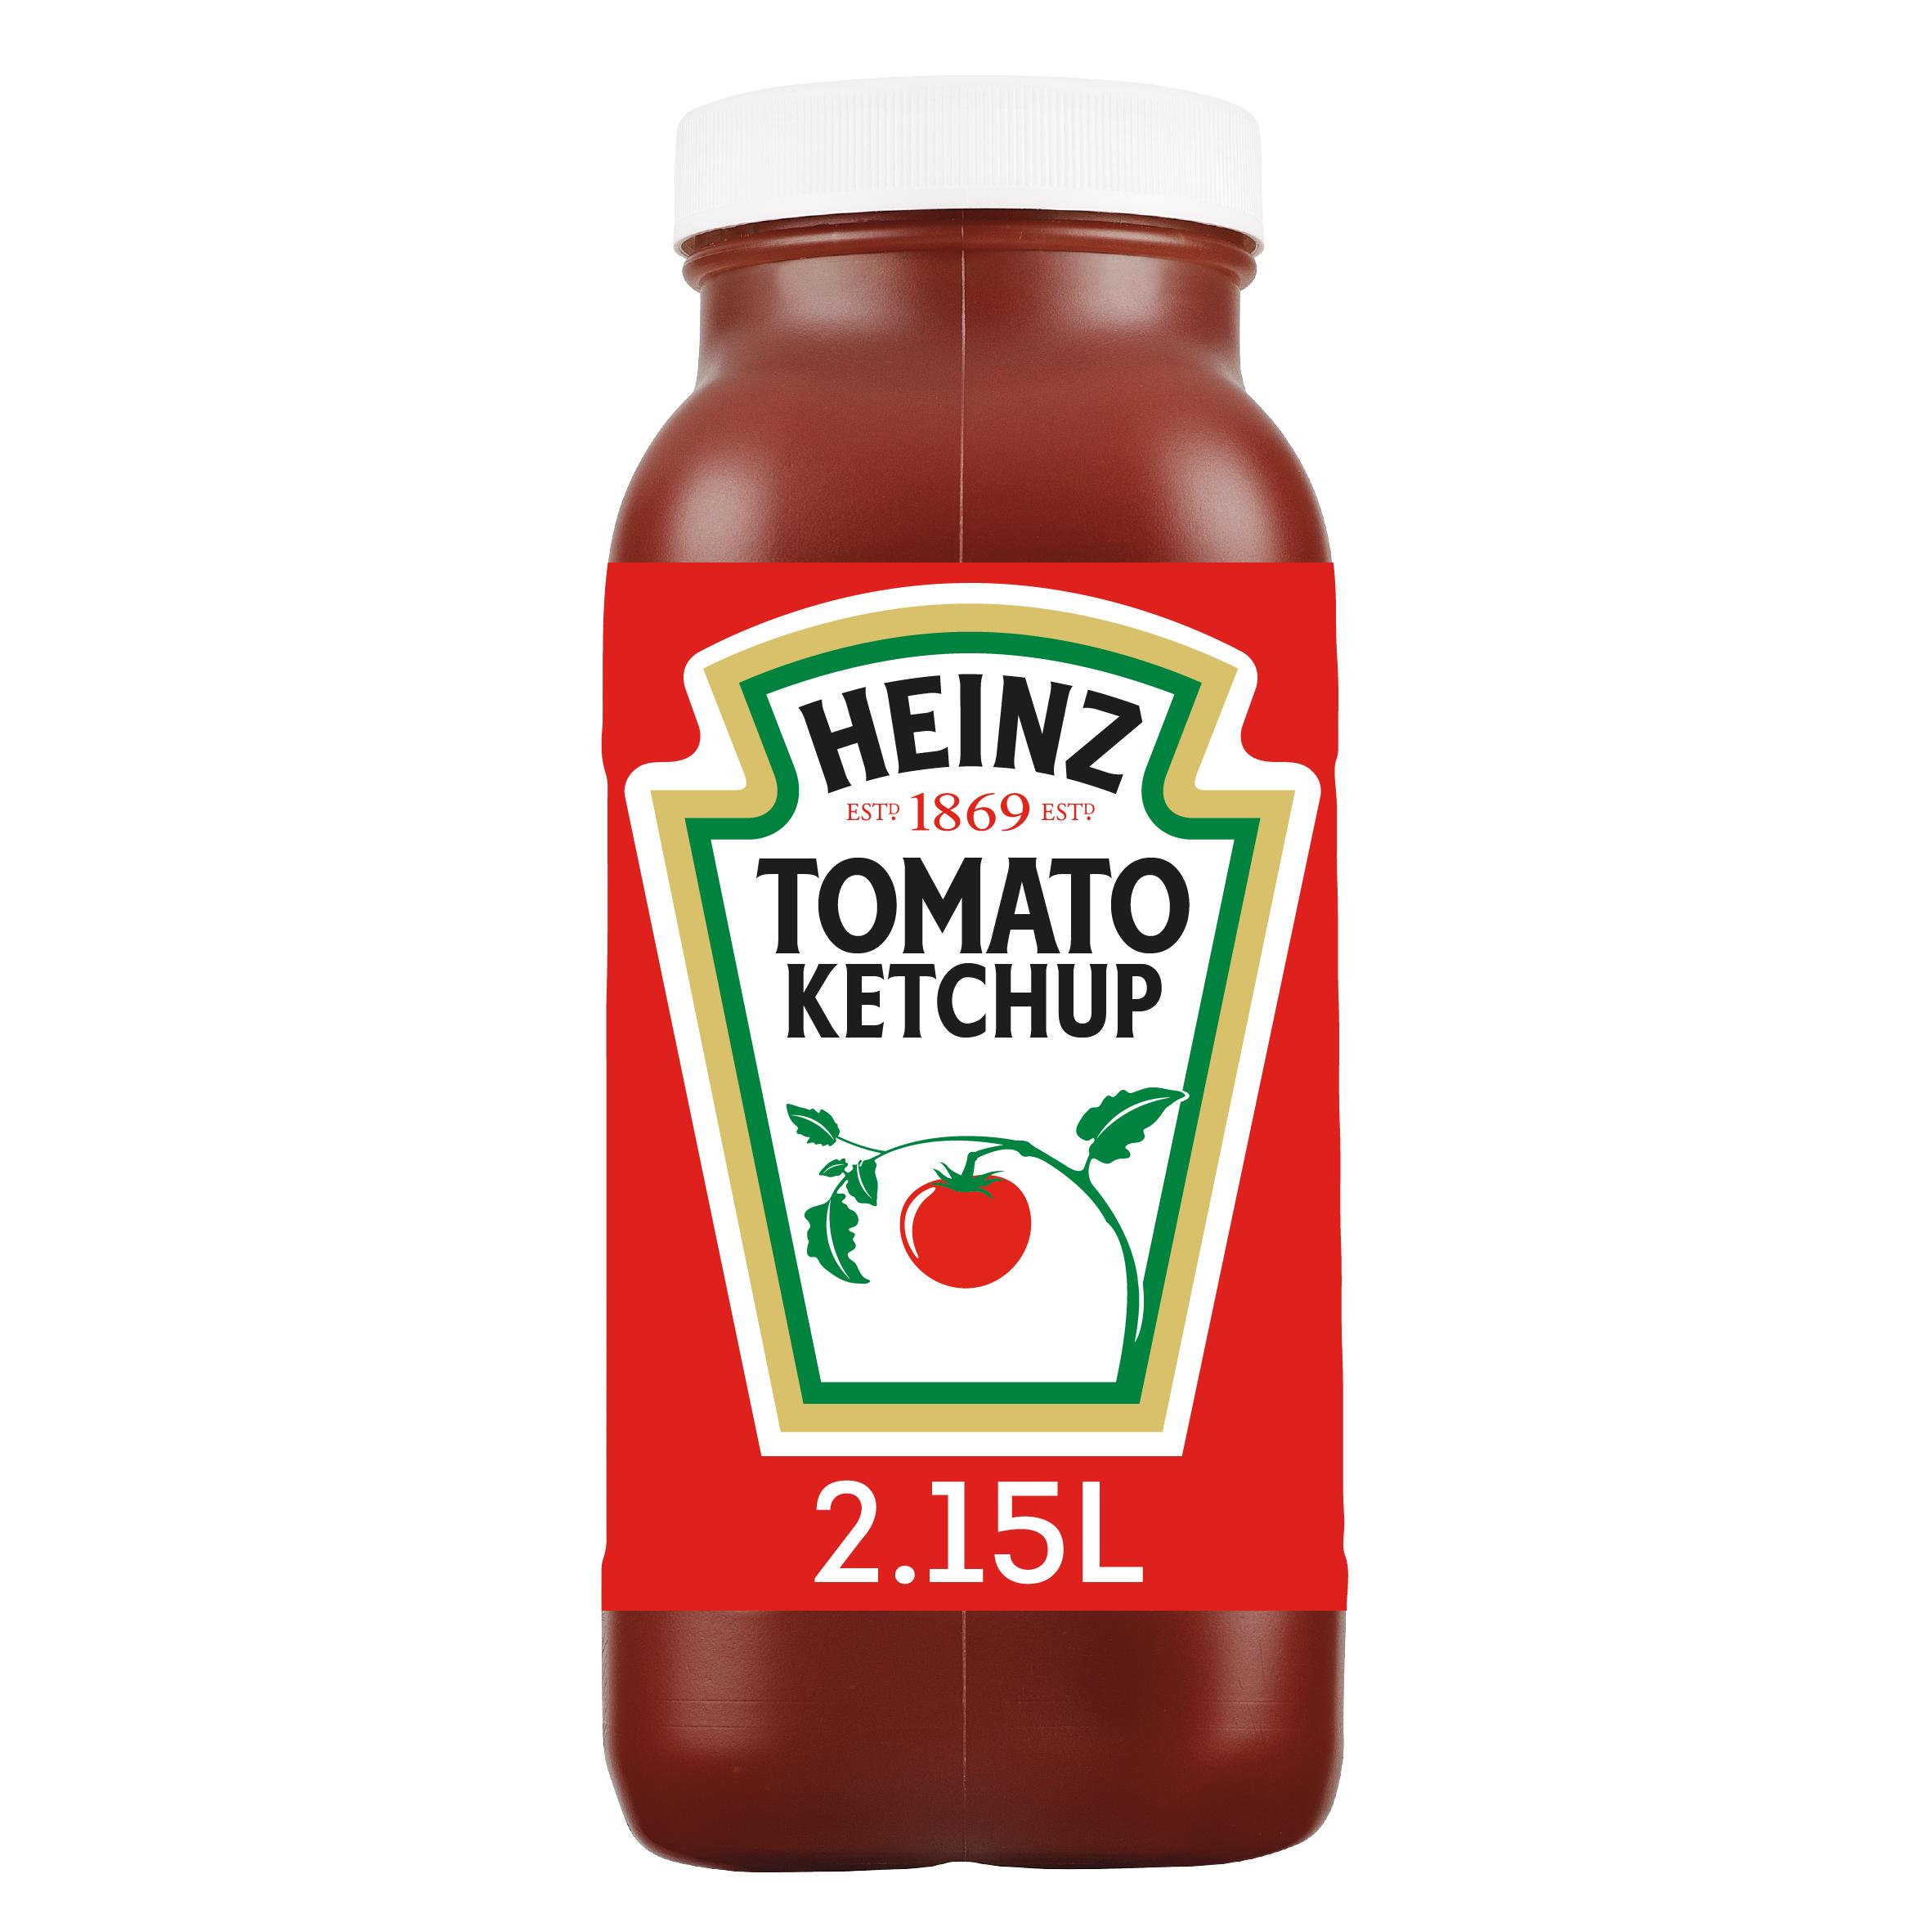 Heinz Tomato Ketchup 2.4kg image